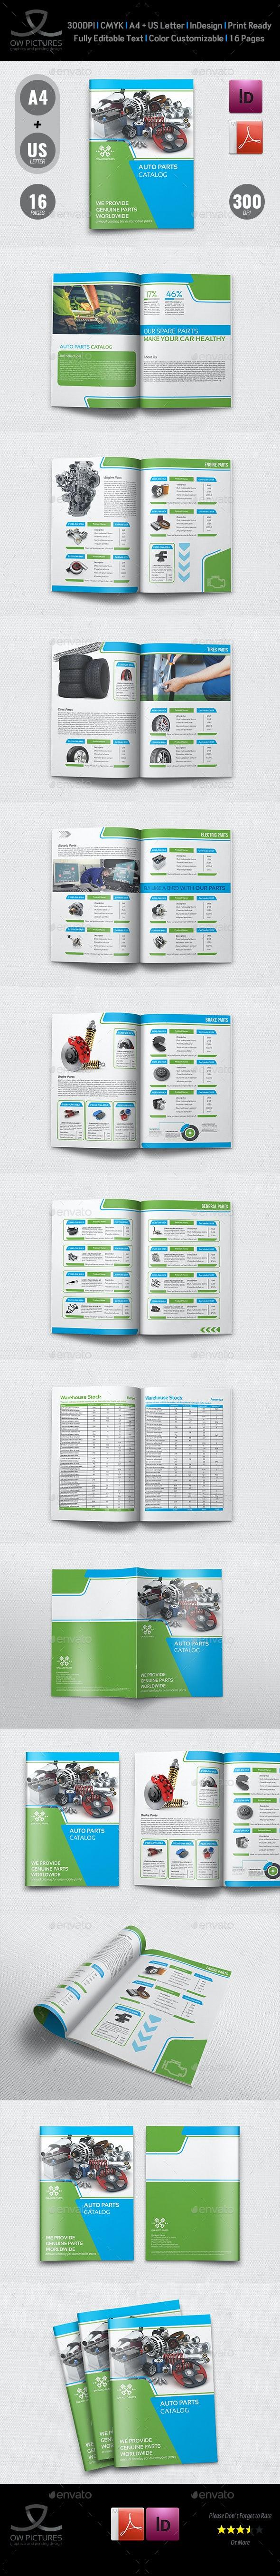 Auto Parts Catalog Brochure Template Vol.3 - 16 Pages - Catalogs Brochures